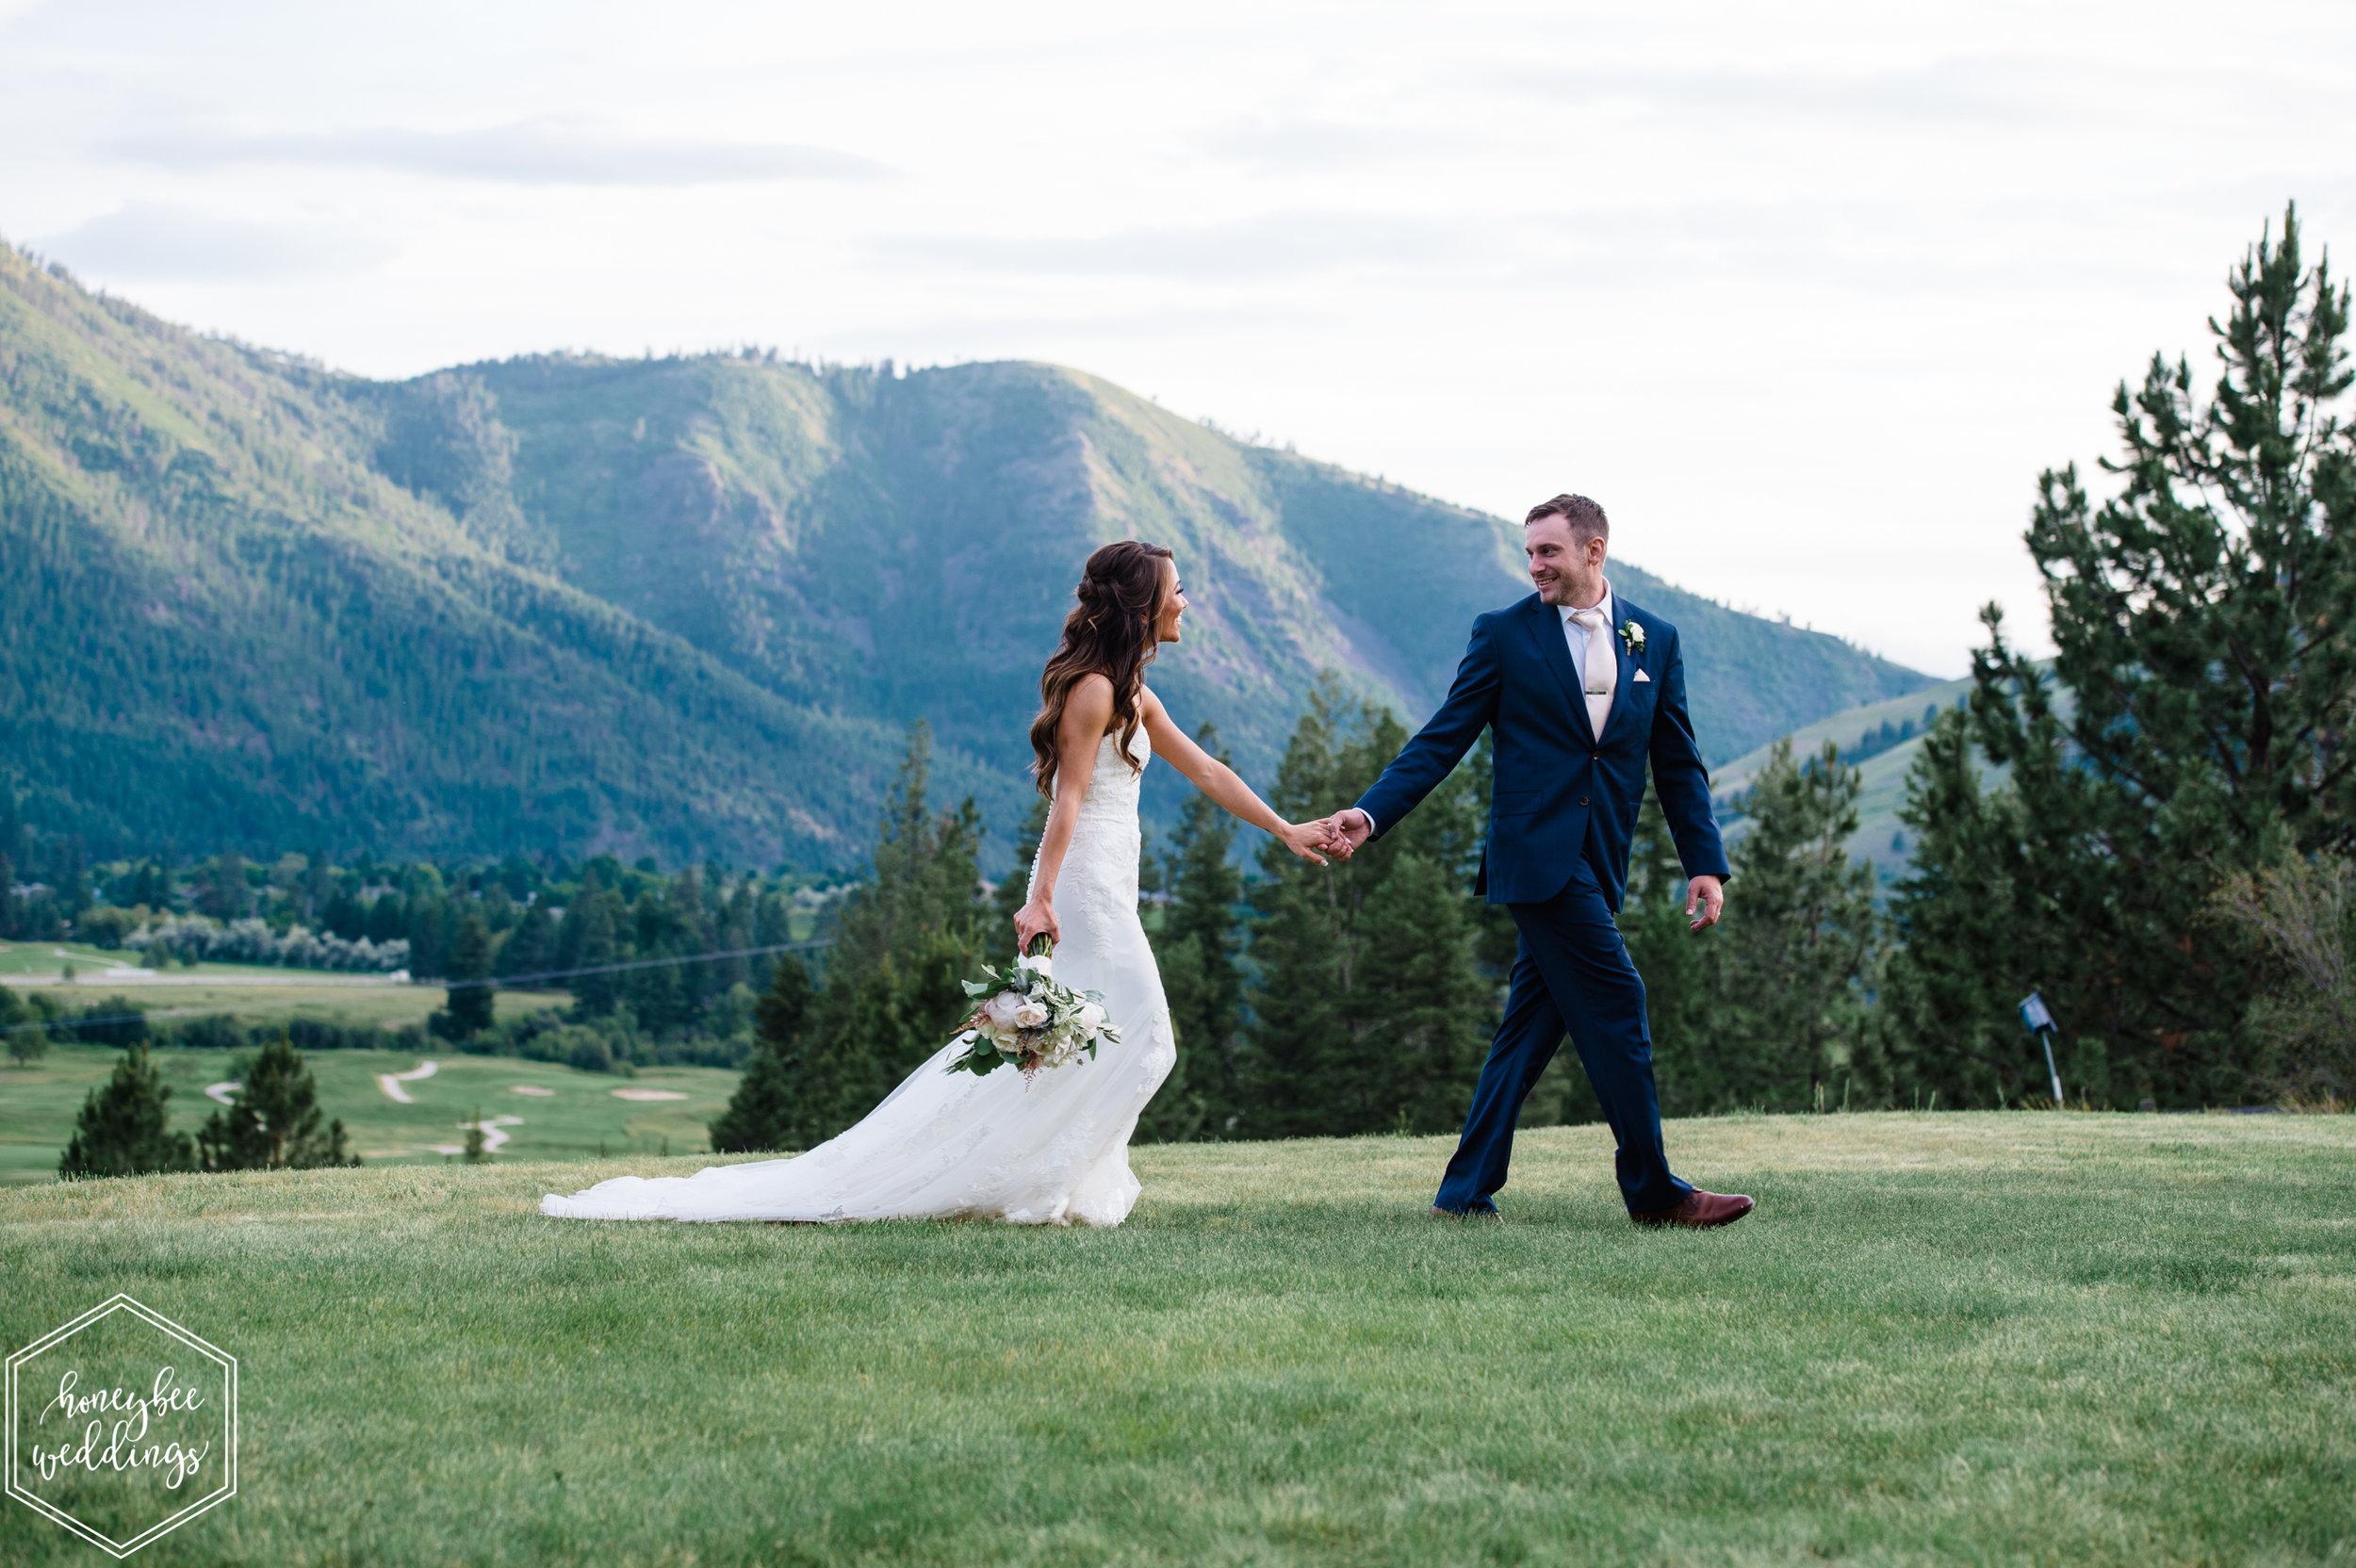 335Montana Wedding Photographer_Missoula Wedding_Honeybee Weddings_Devlin & Jacob_June 22, 2019-1230.jpg